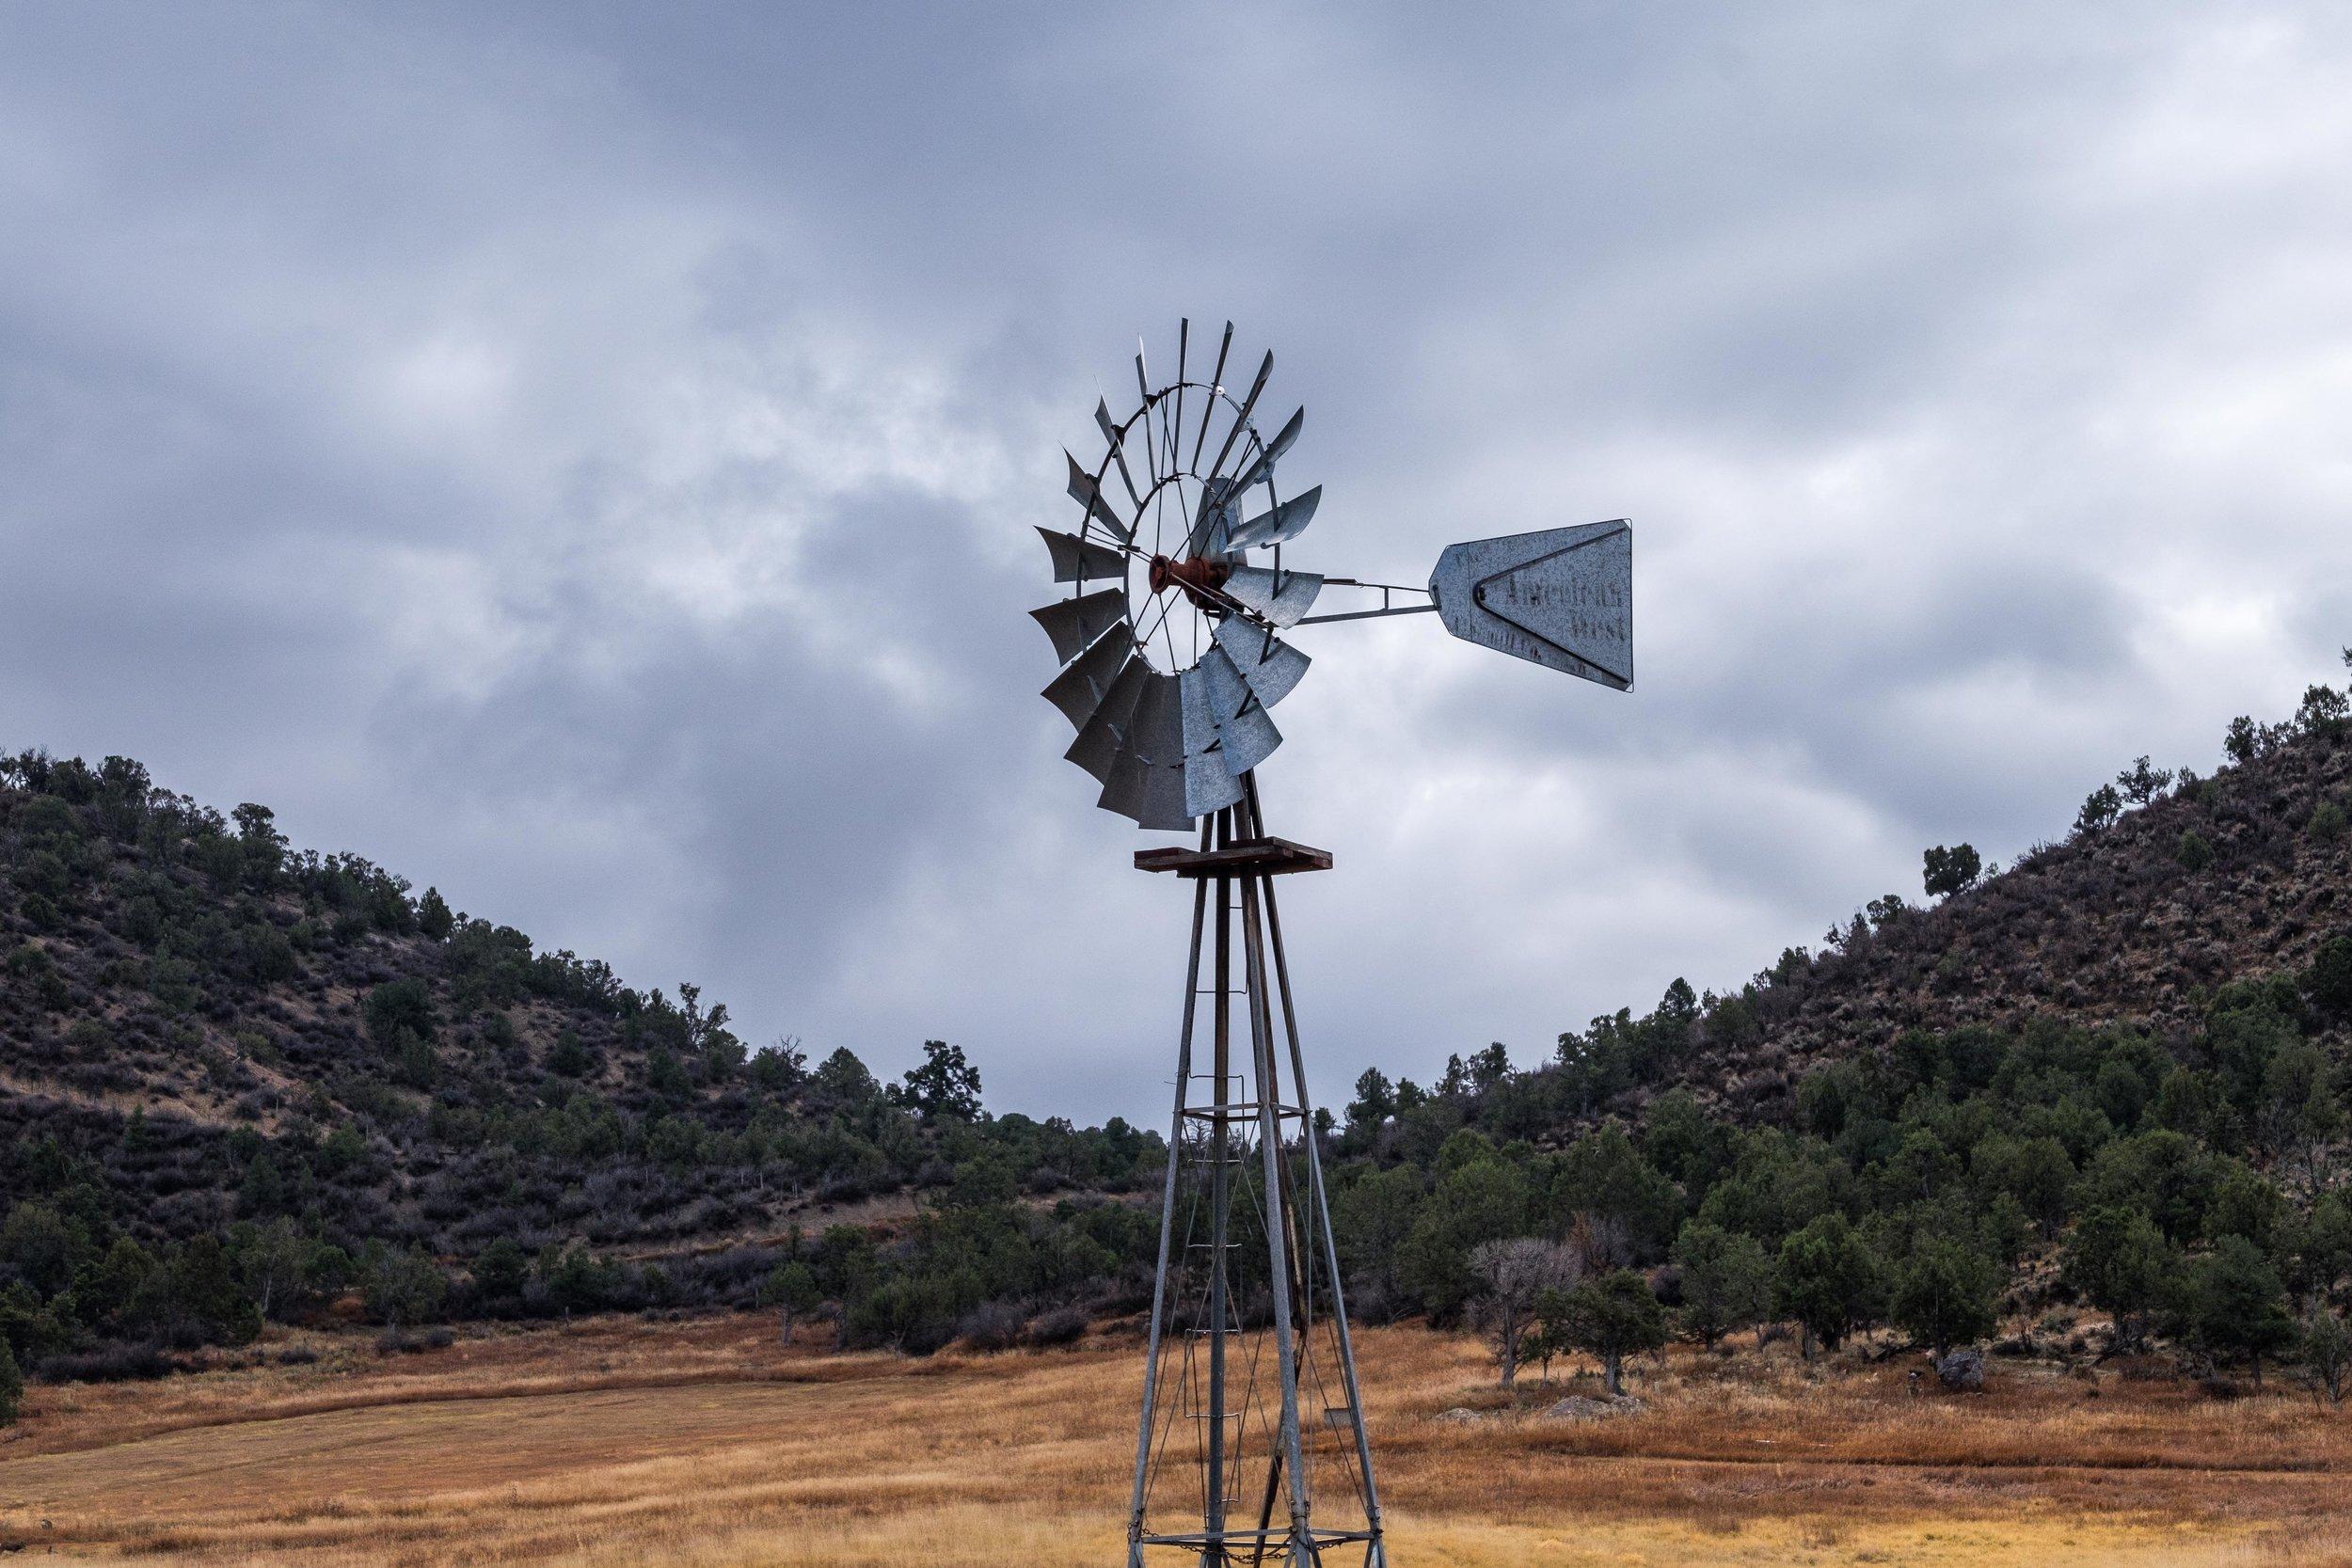 Stef finally got a photo of her windmill.